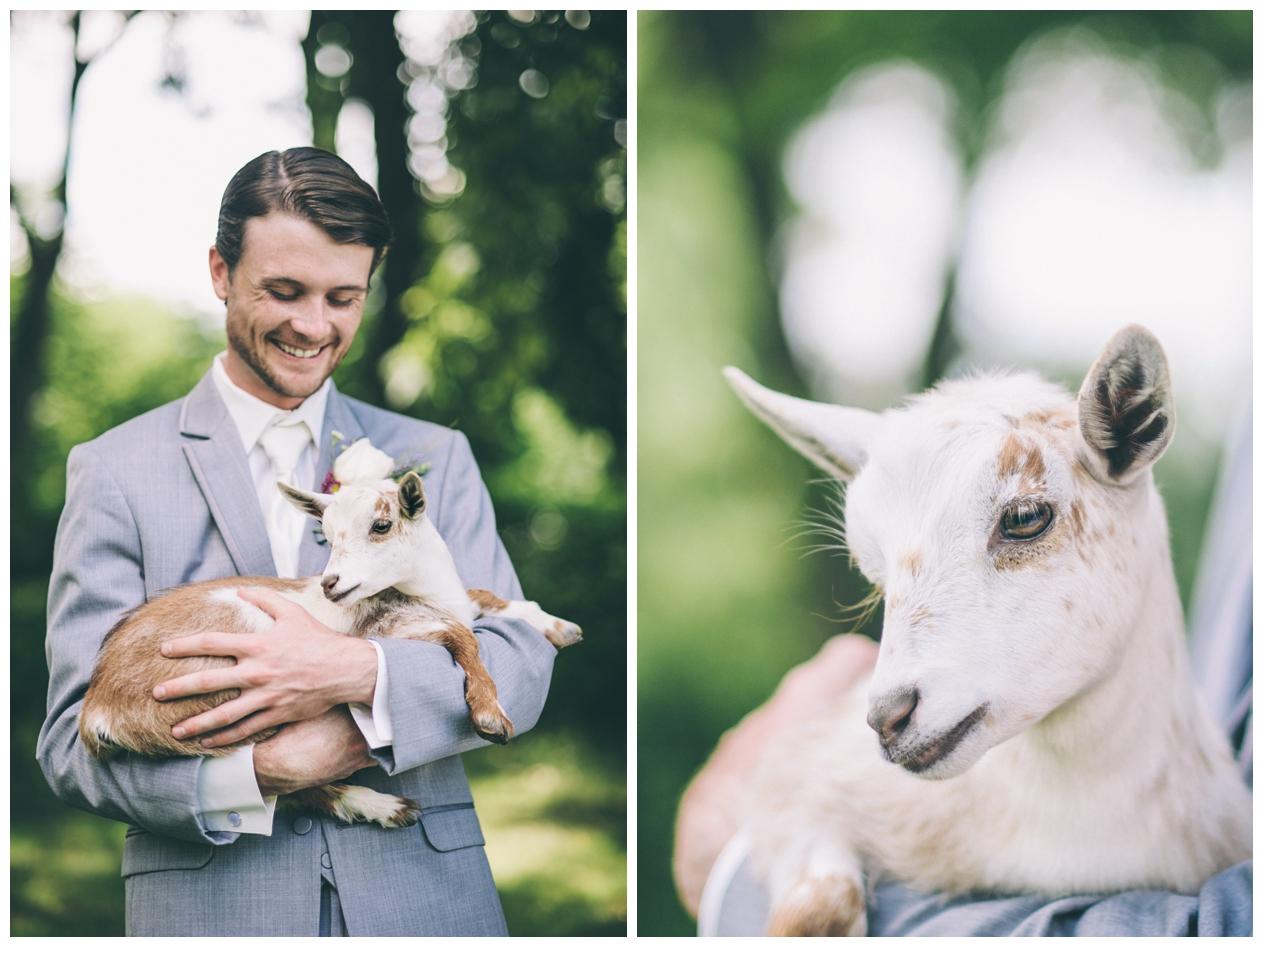 024-AmandaKoppImages-Colorado-Farm-Wedding-Photo.jpg